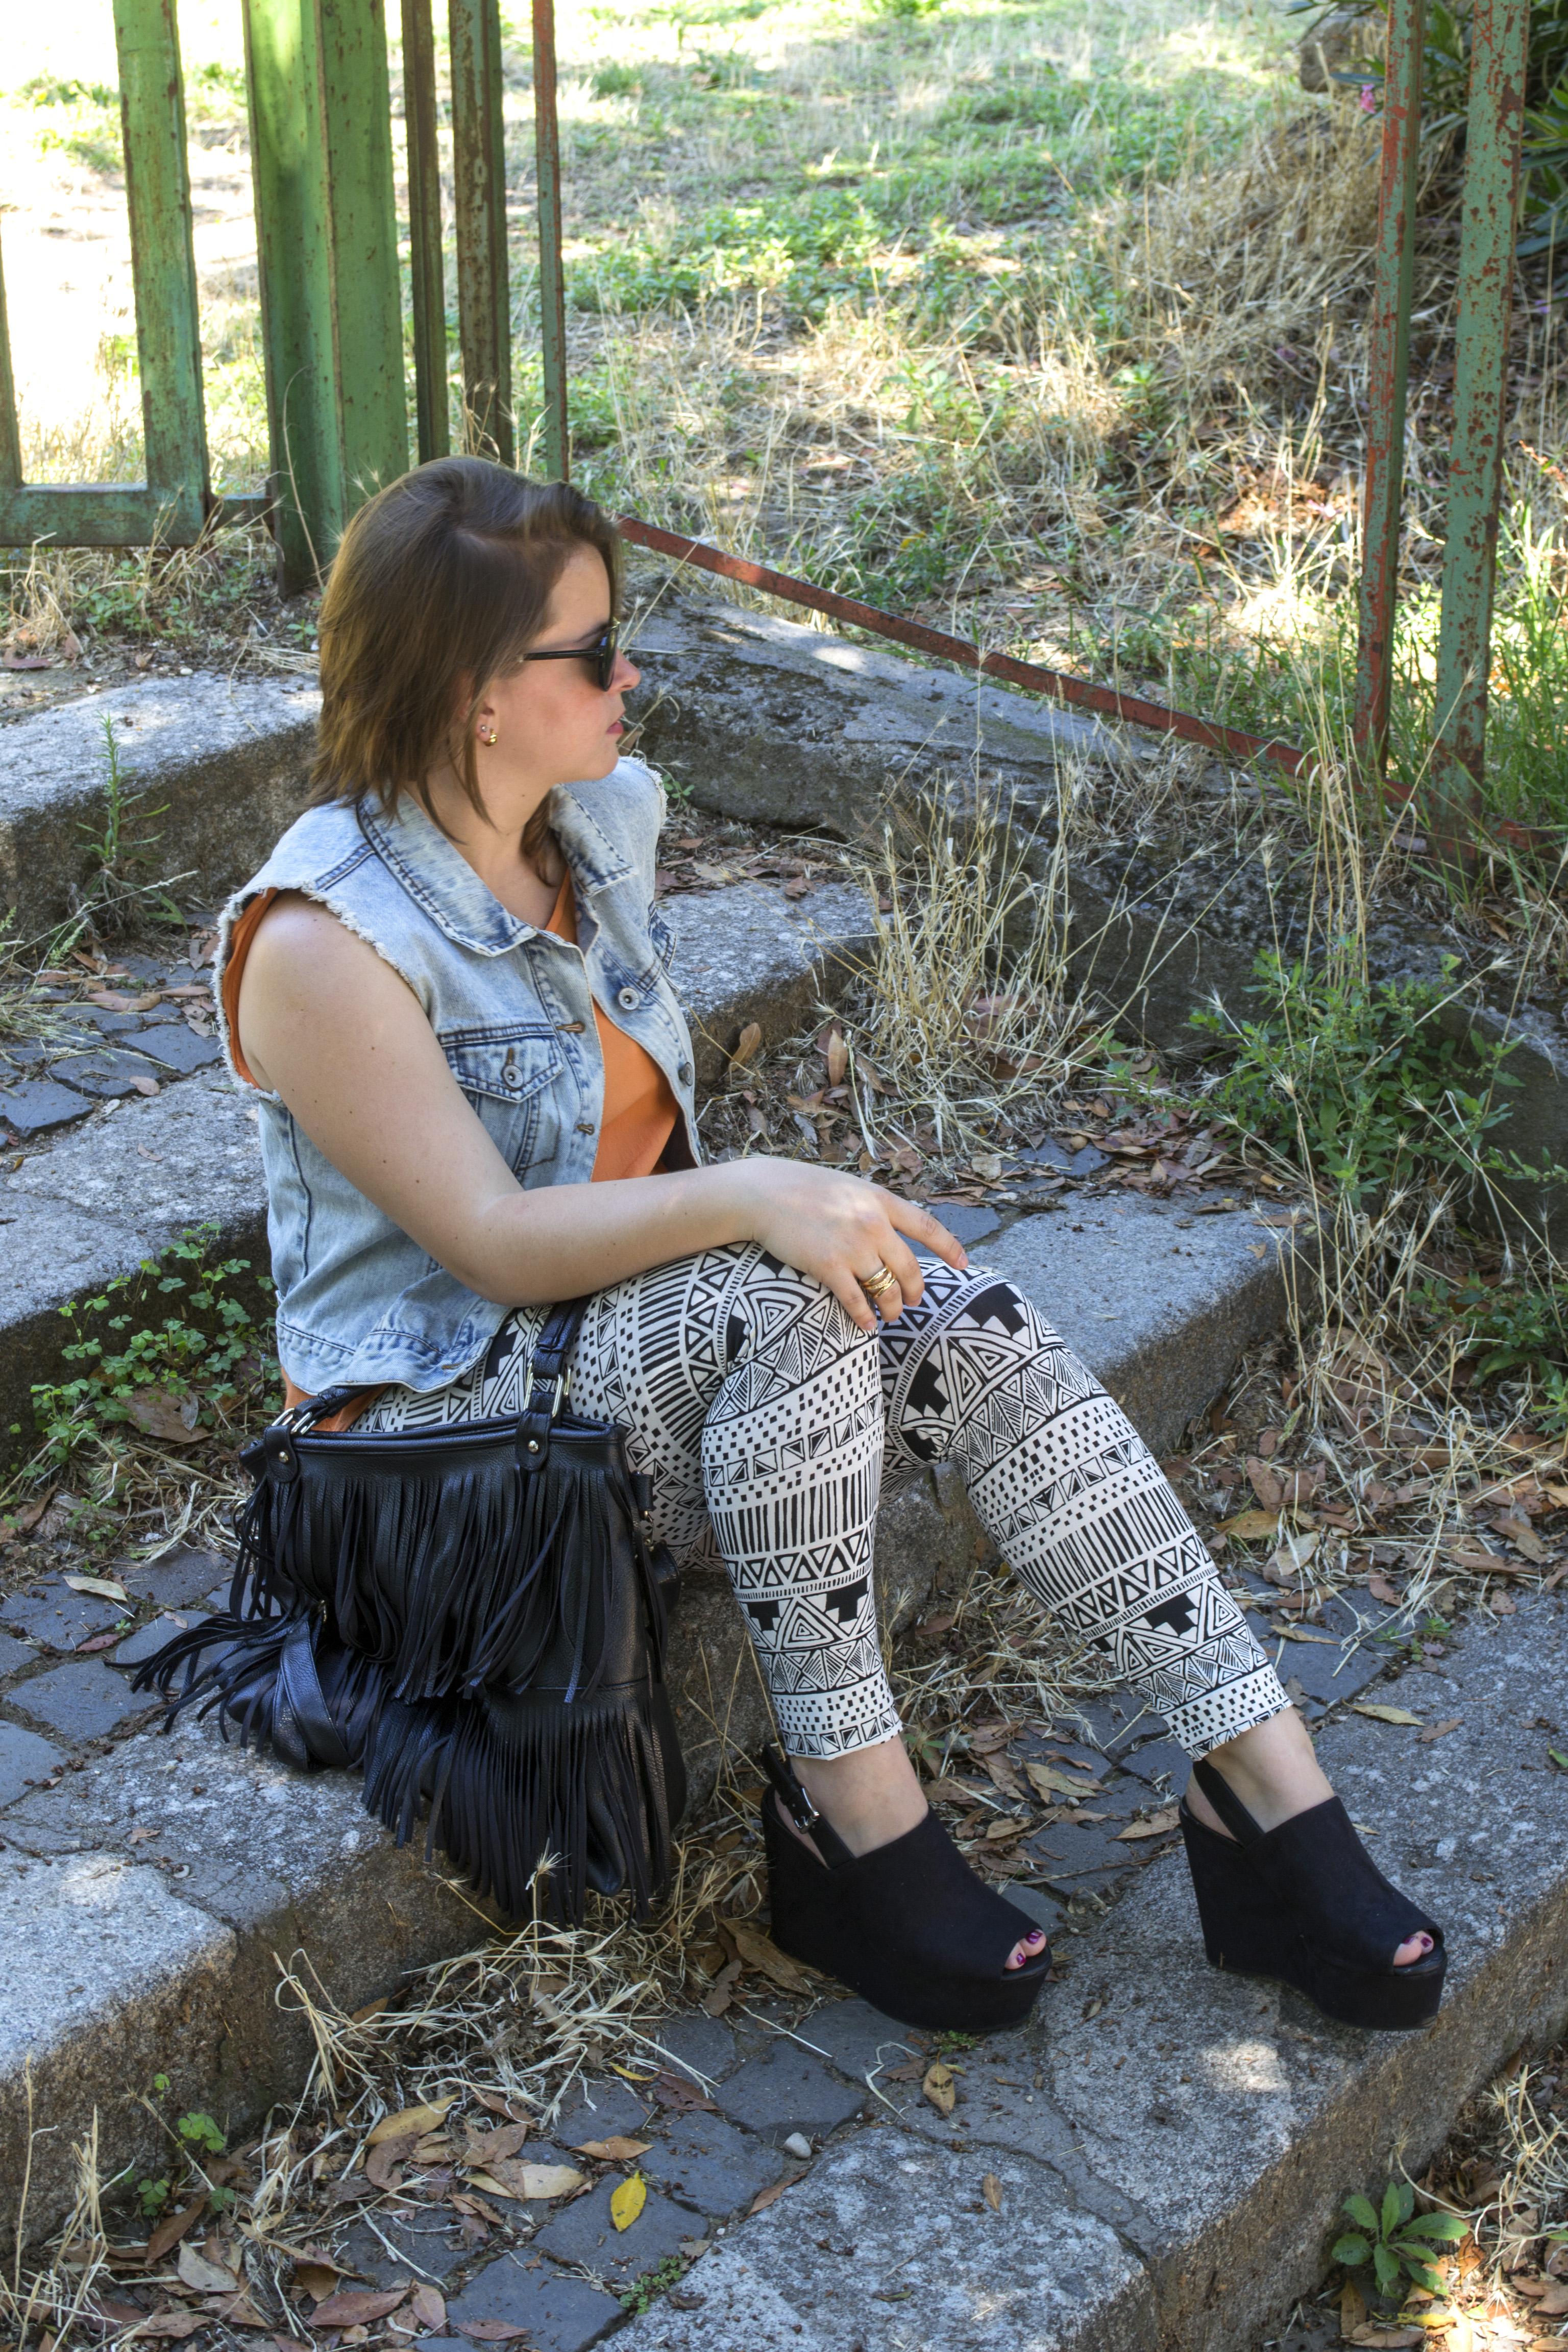 Hermosa en leggins negros - 3 part 10